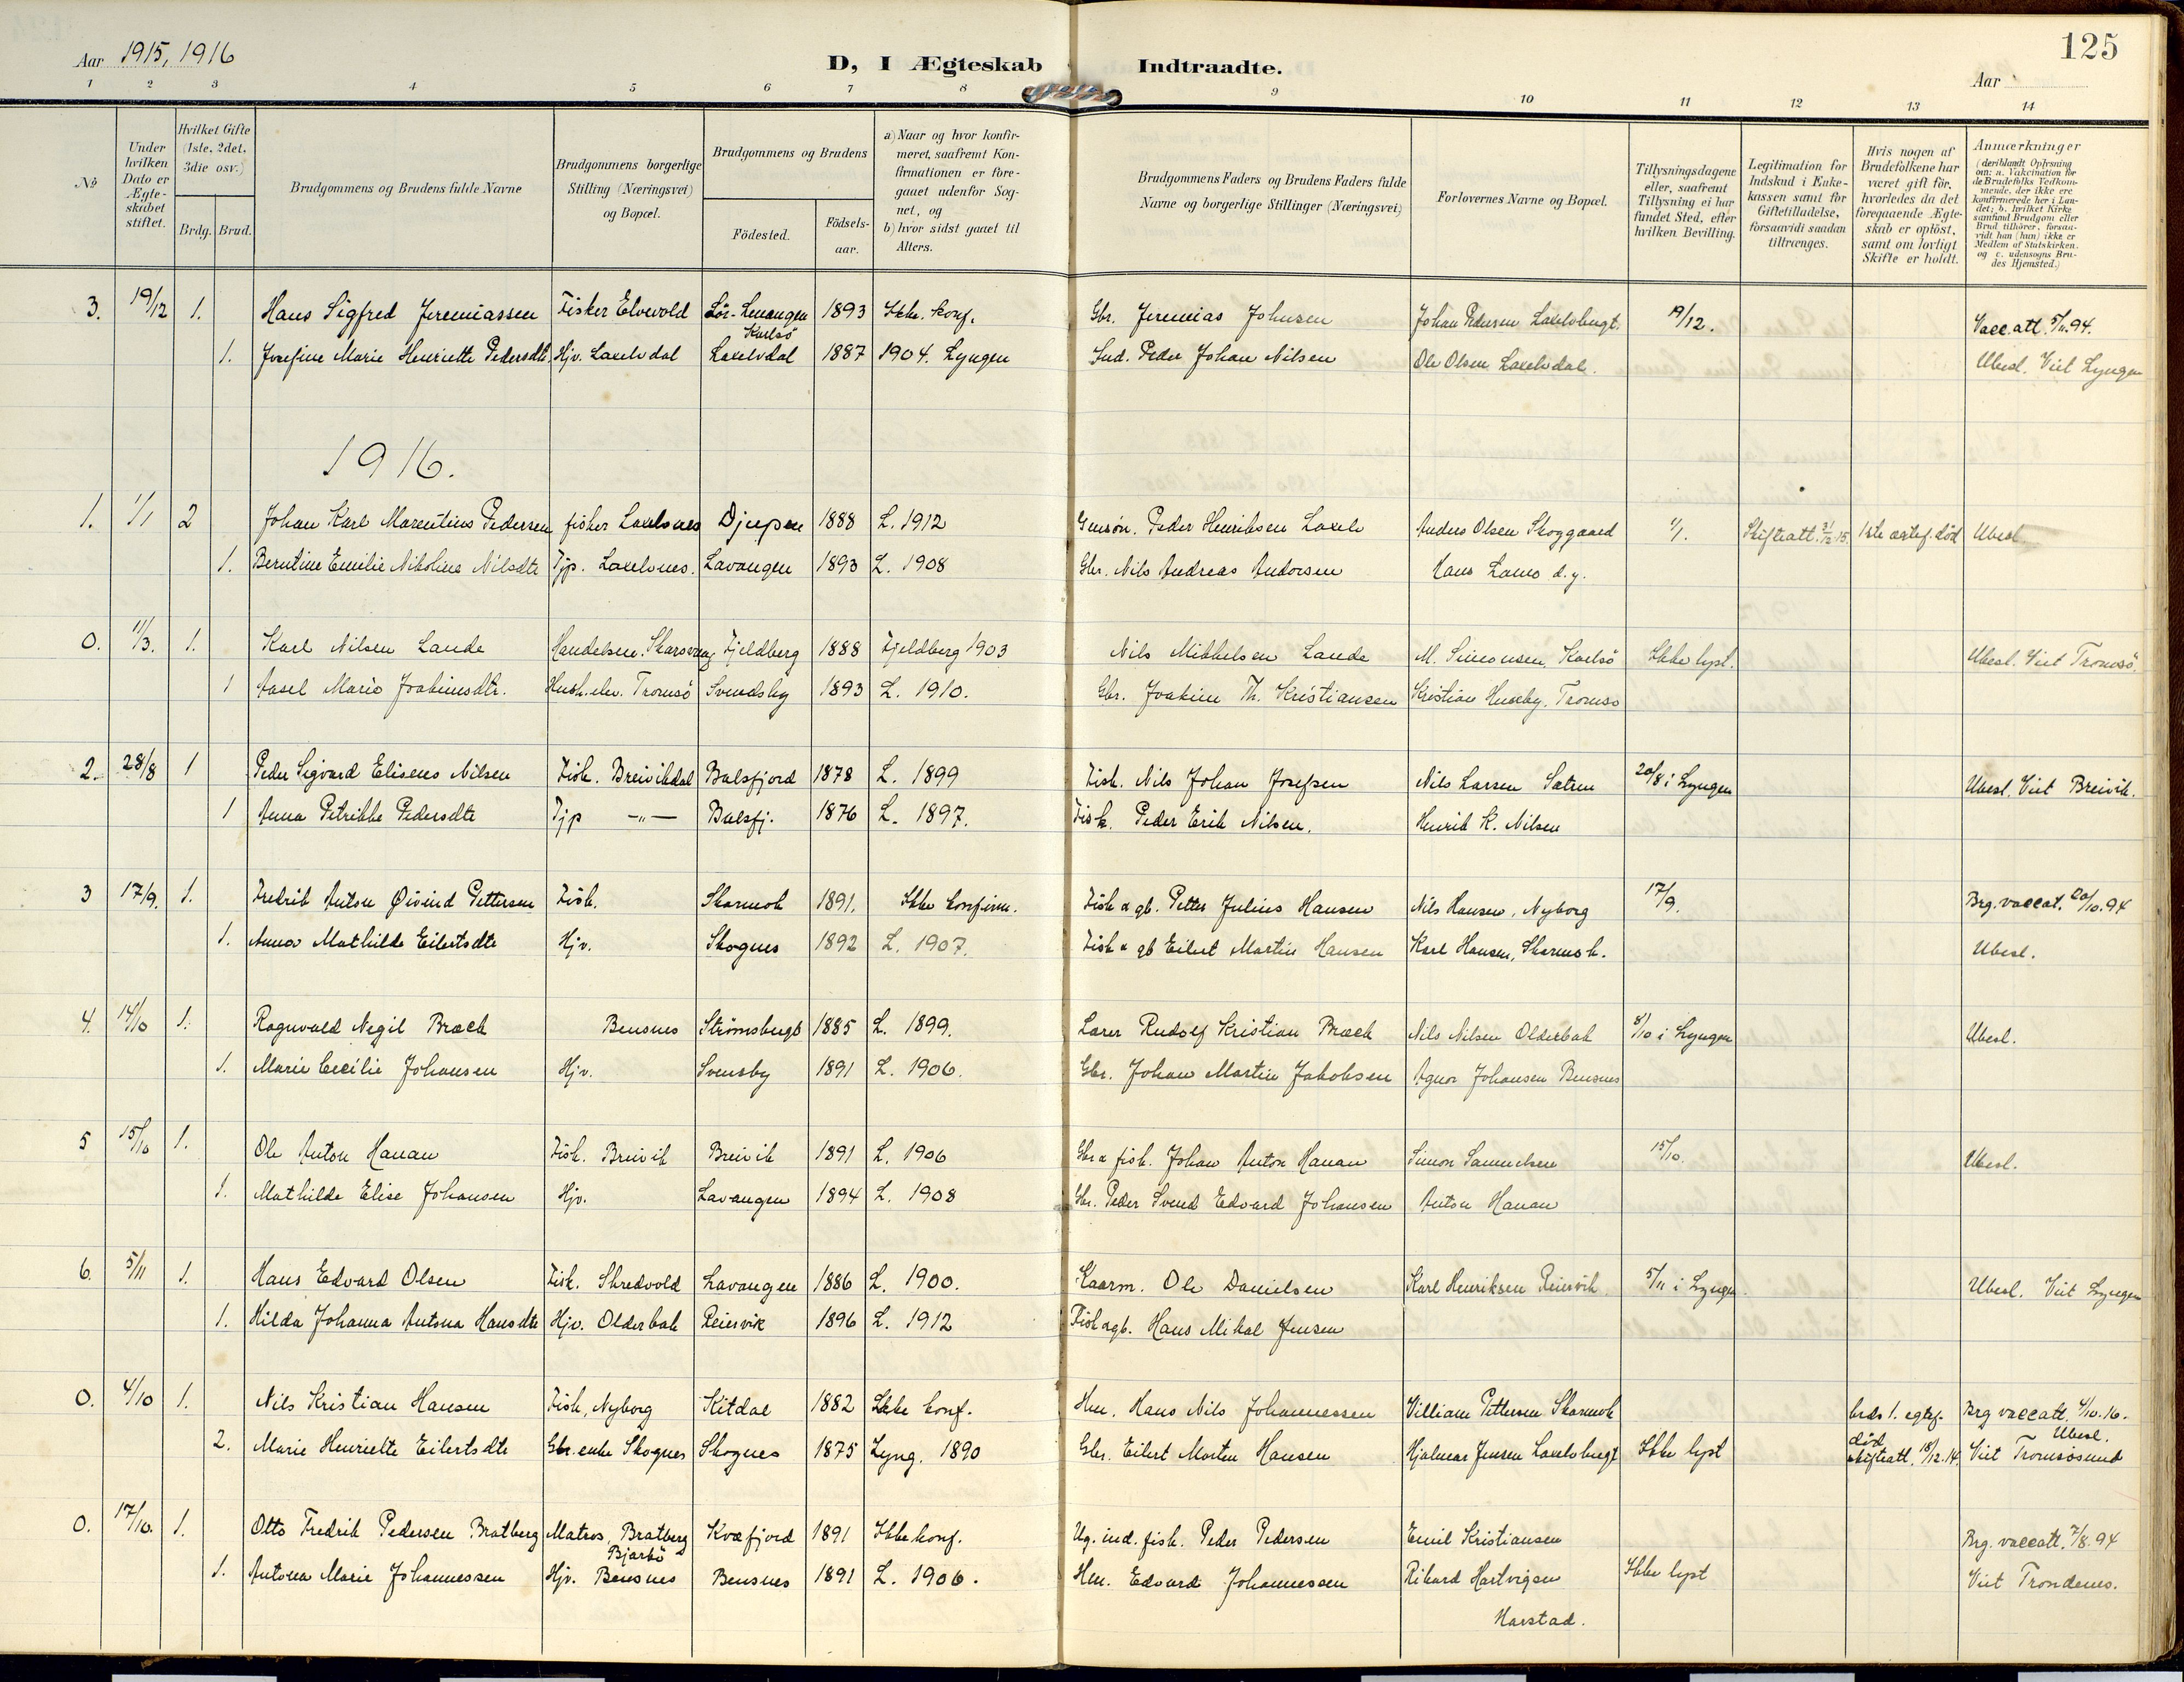 SATØ, Lyngen sokneprestembete, Ministerialbok nr. 14, 1905-1920, s. 125